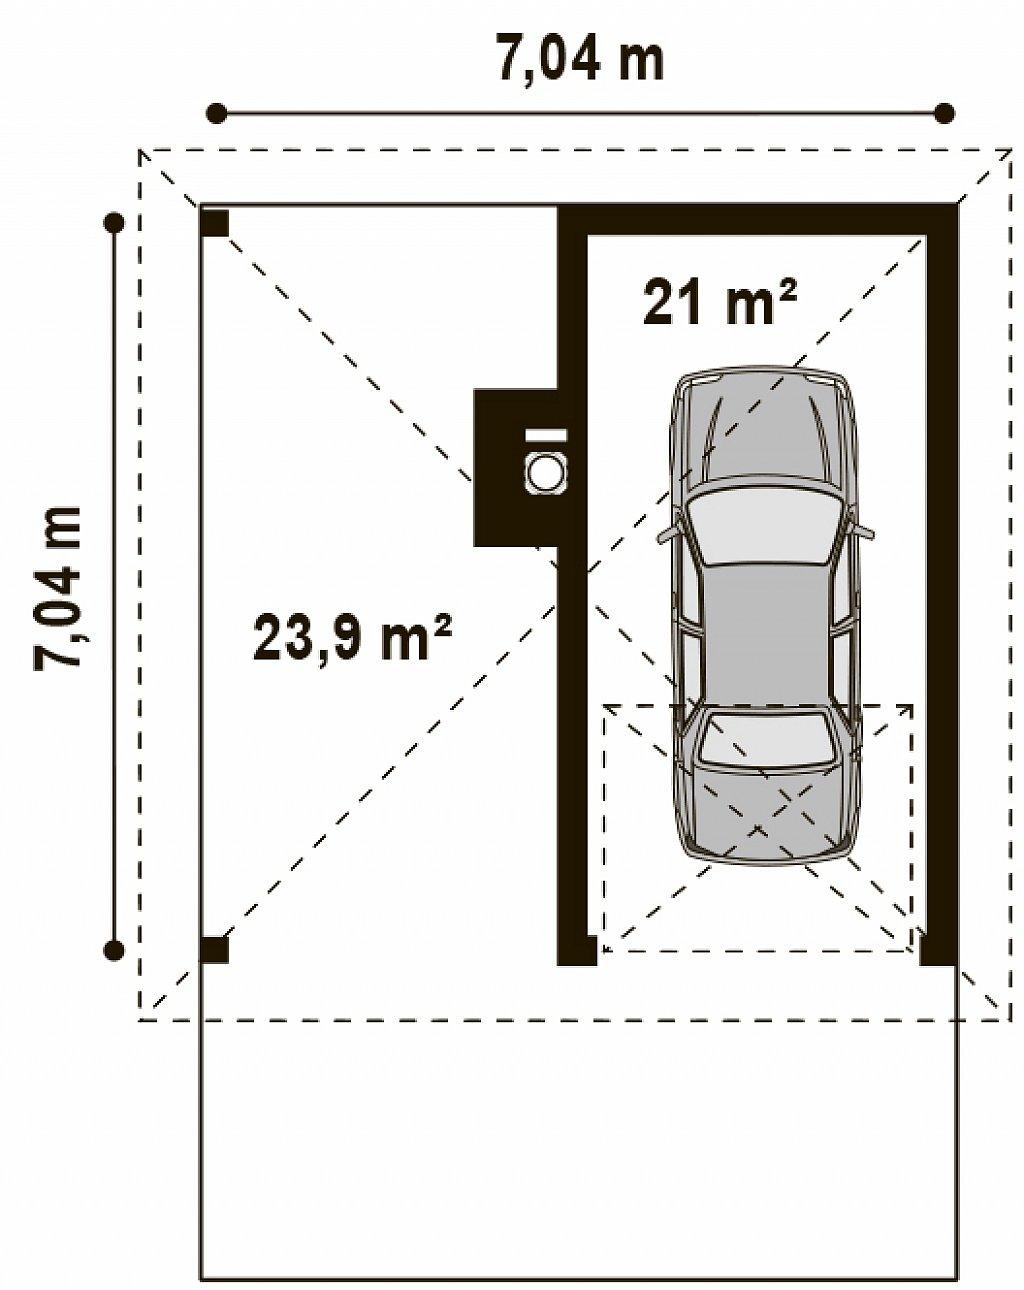 Площадь 21м² гаража Zg14